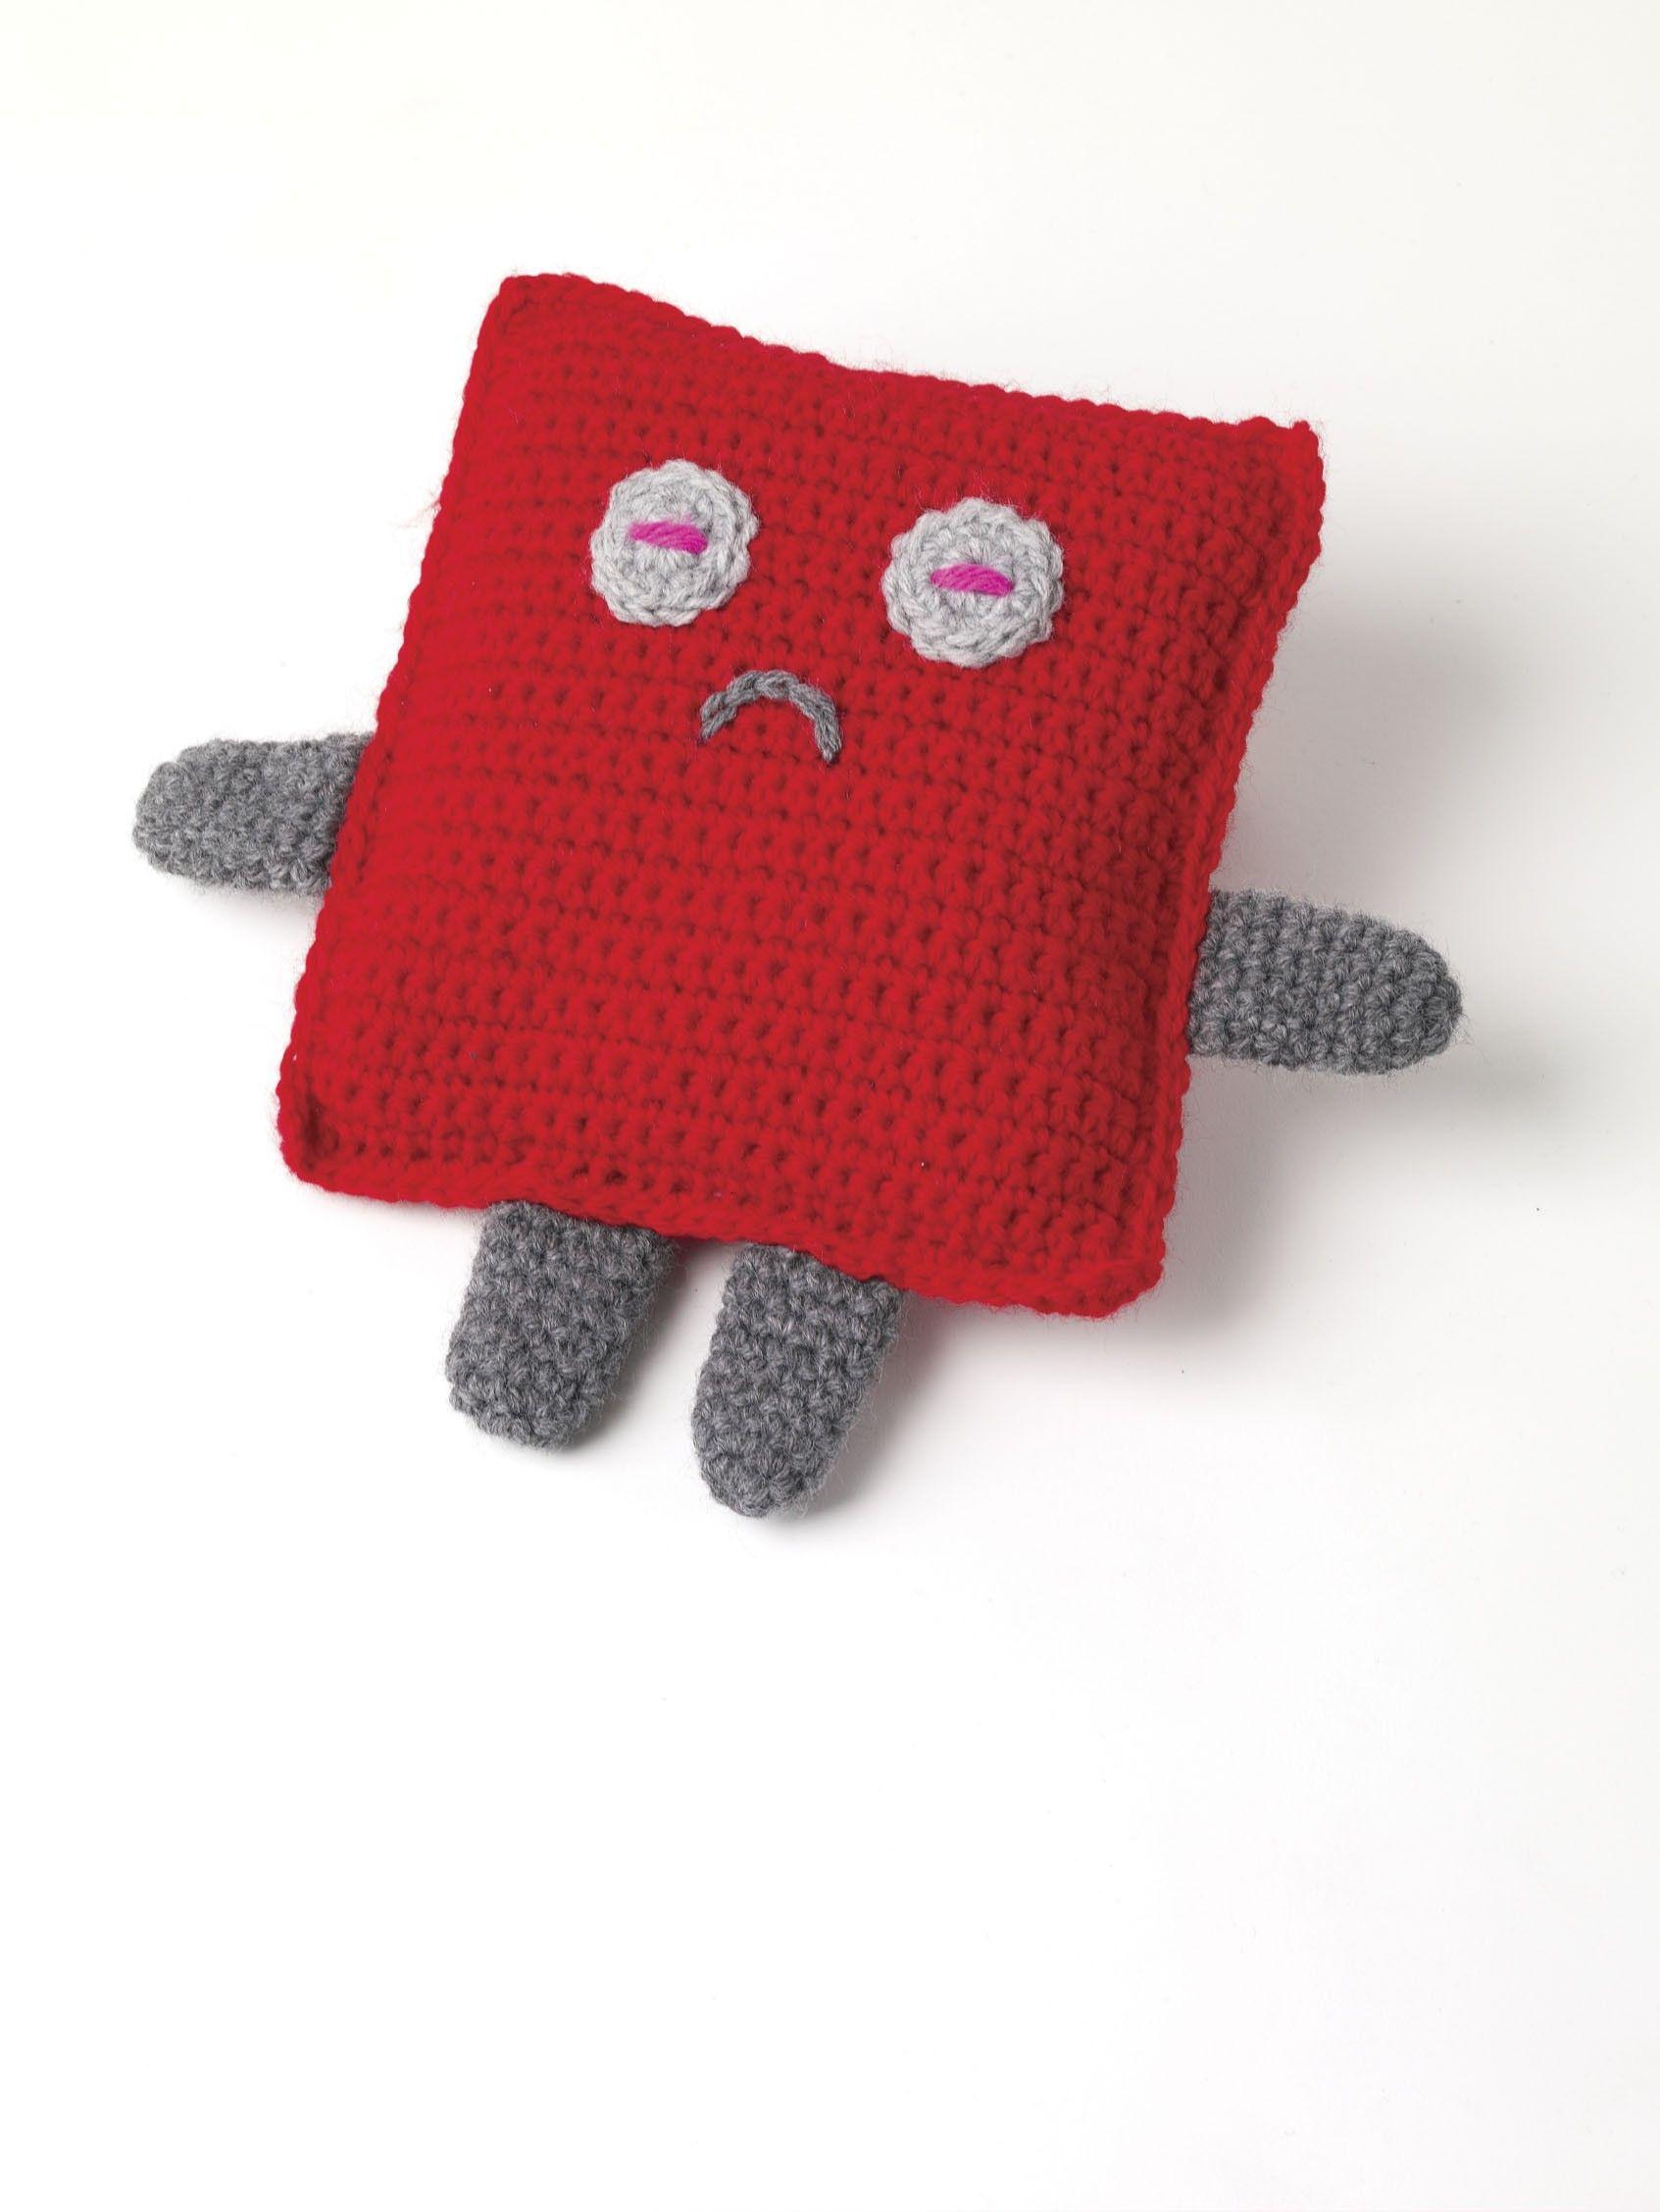 Best Buddies Soft Toys (Crochet) | Amigurumi | Pinterest